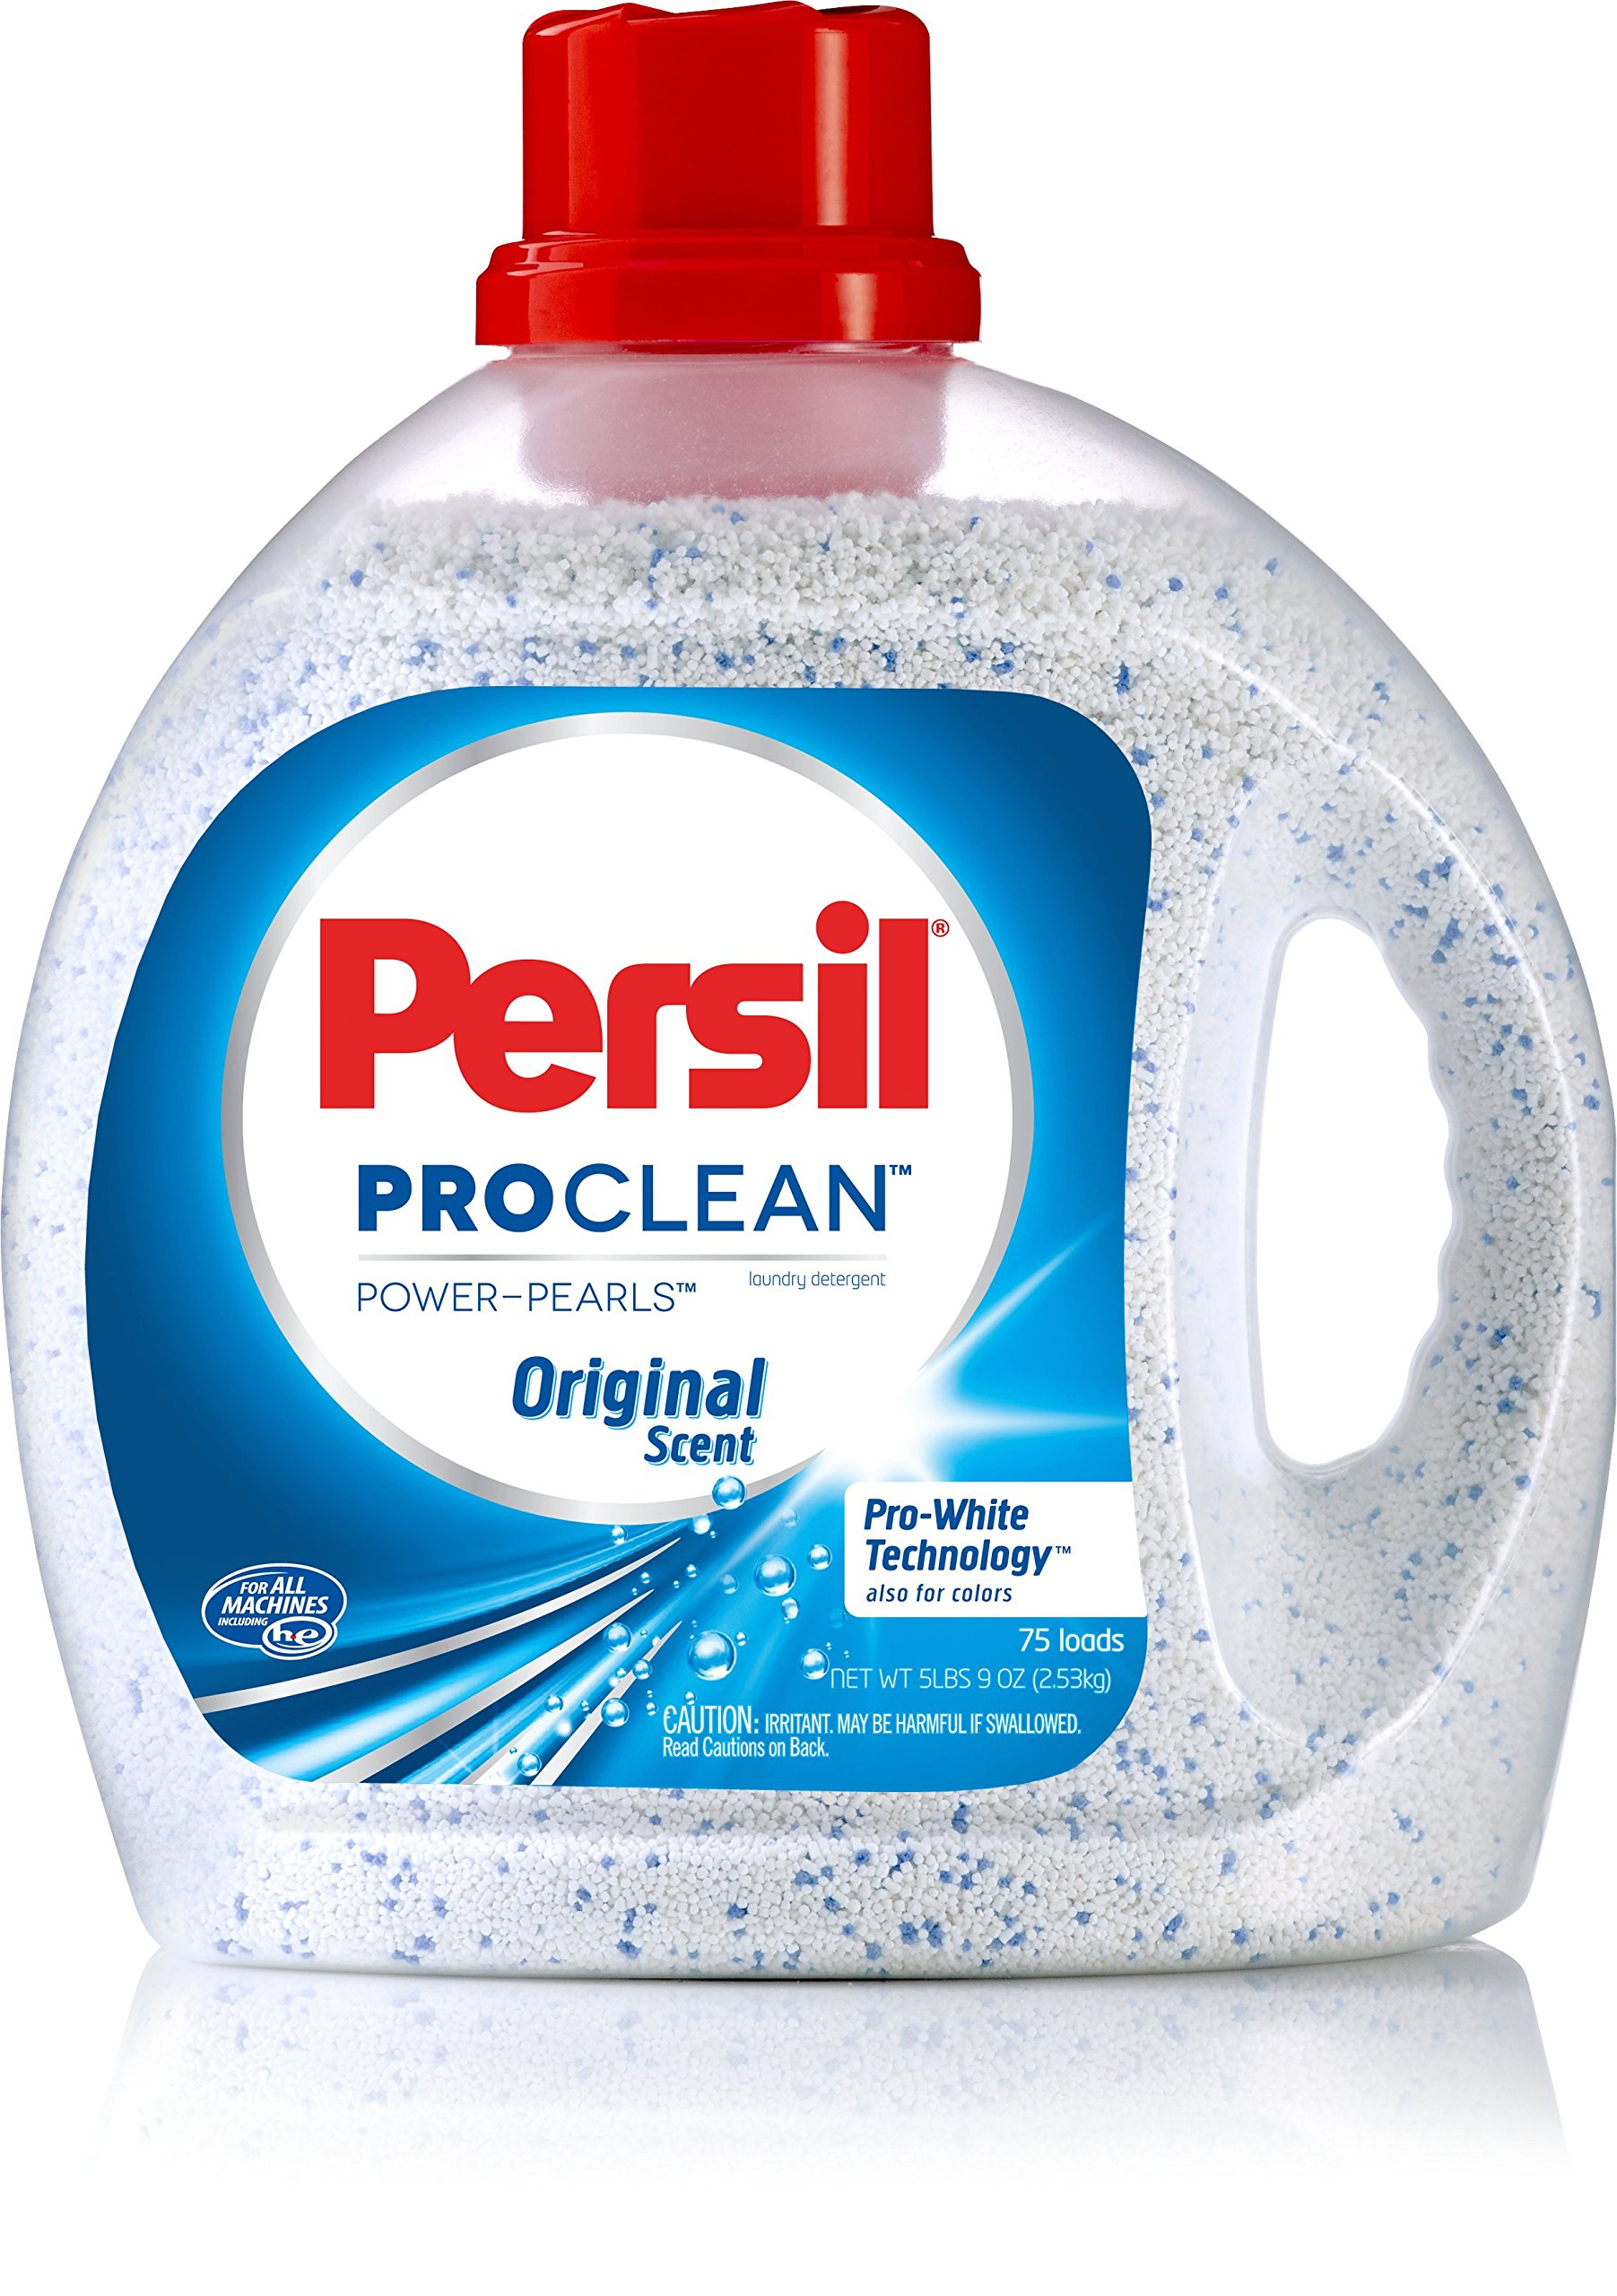 Persil ProClean Power Pearls-Powder Laundry Detergent, Original Scent, 94 Ounces, 75 Loads